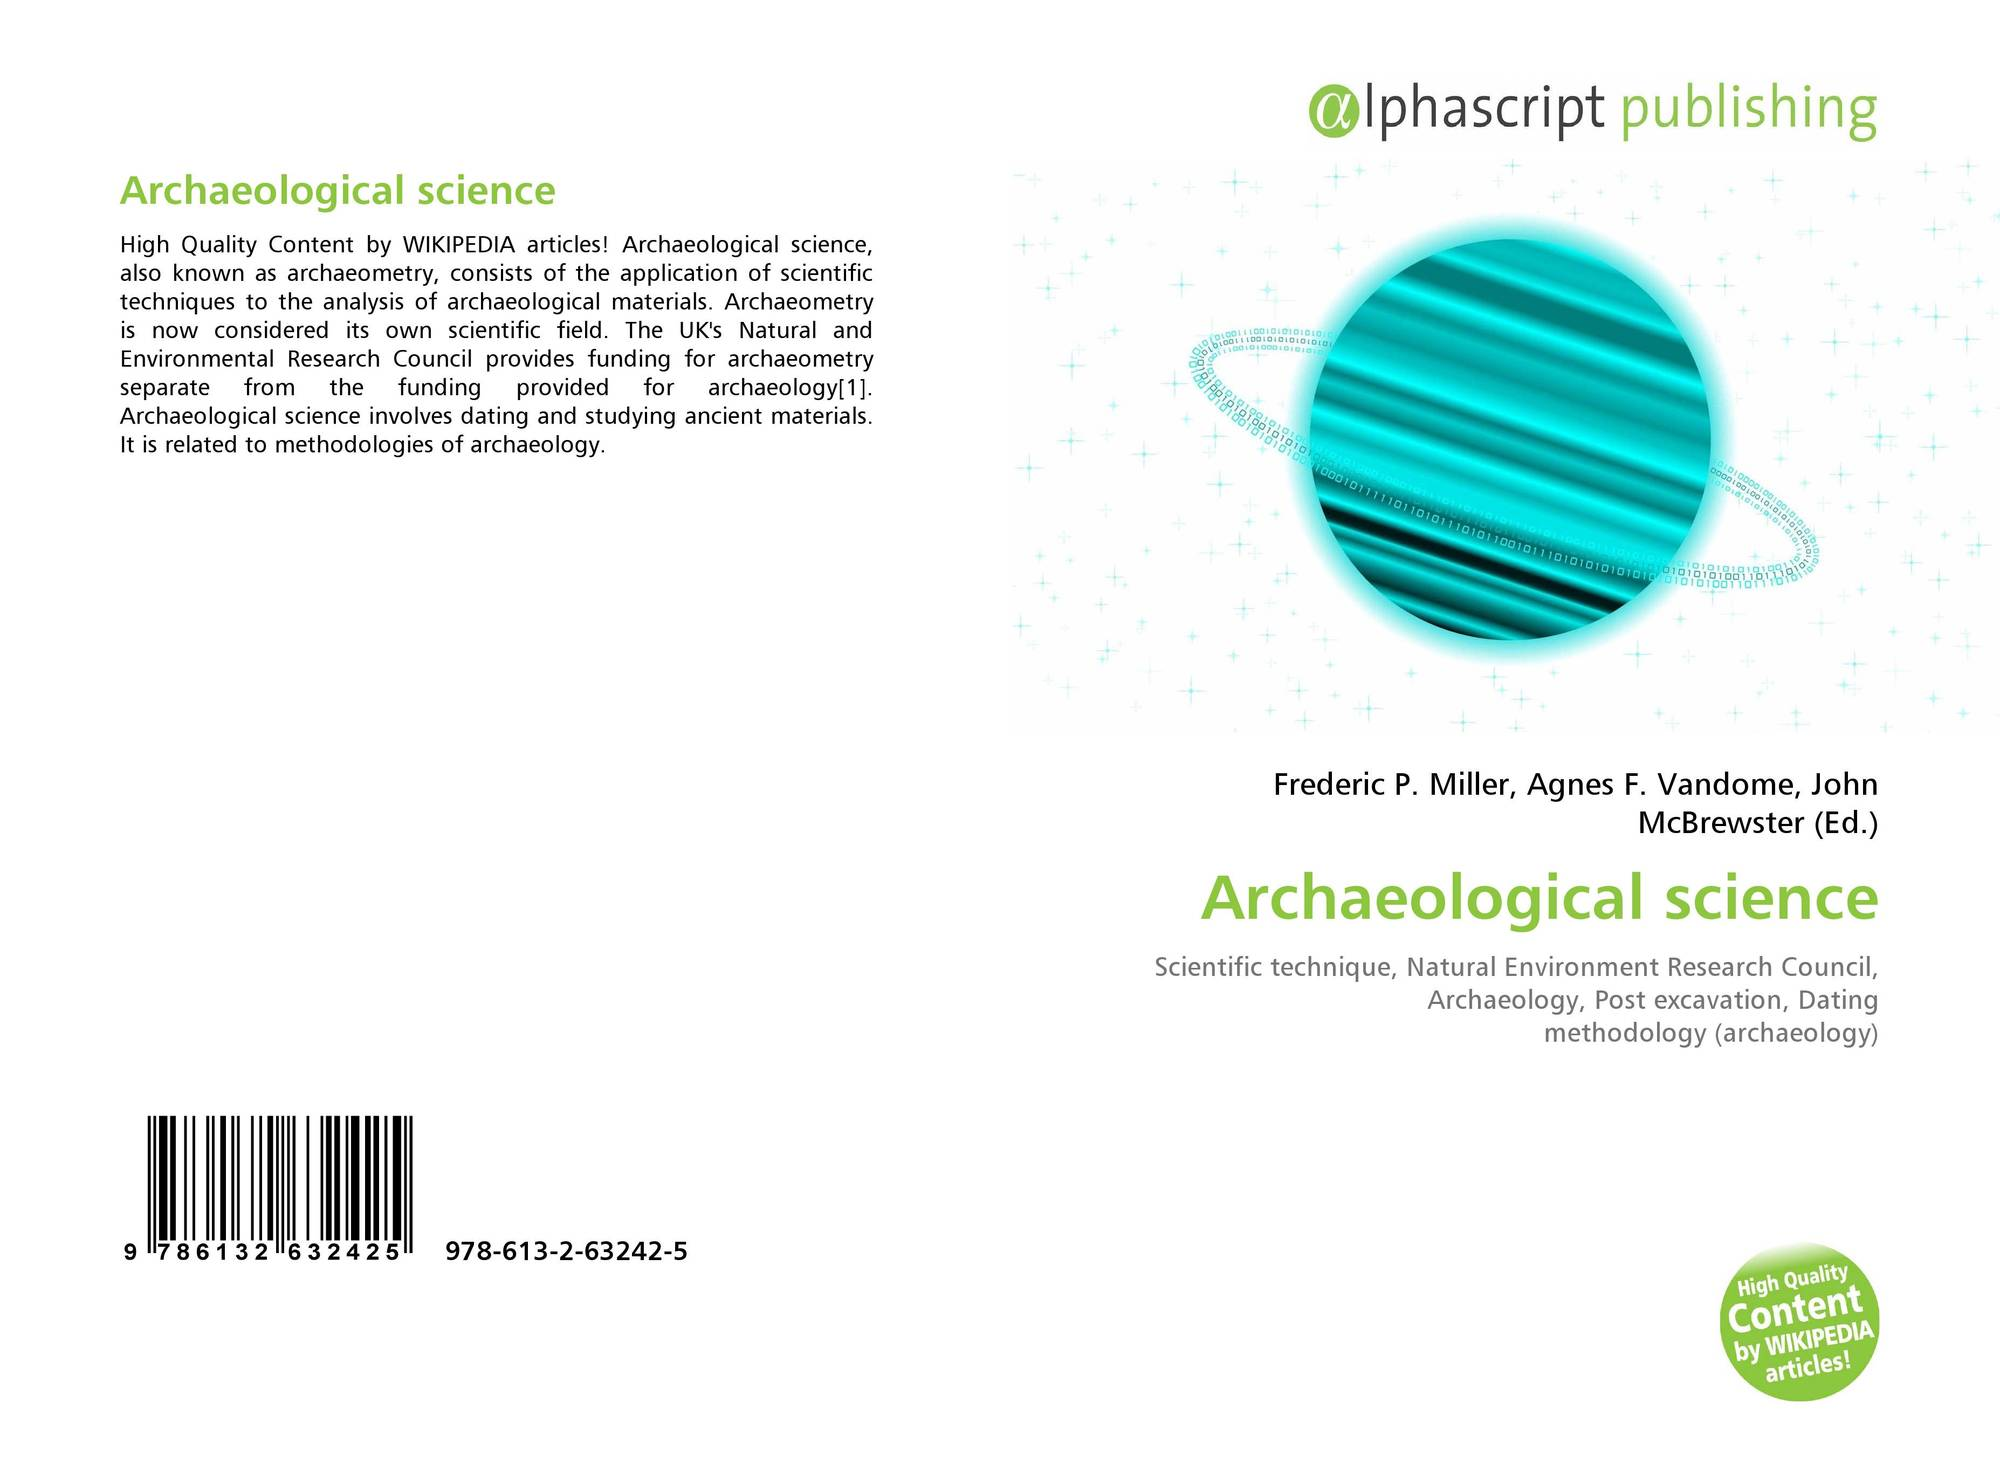 Dating methodologies in archaeology